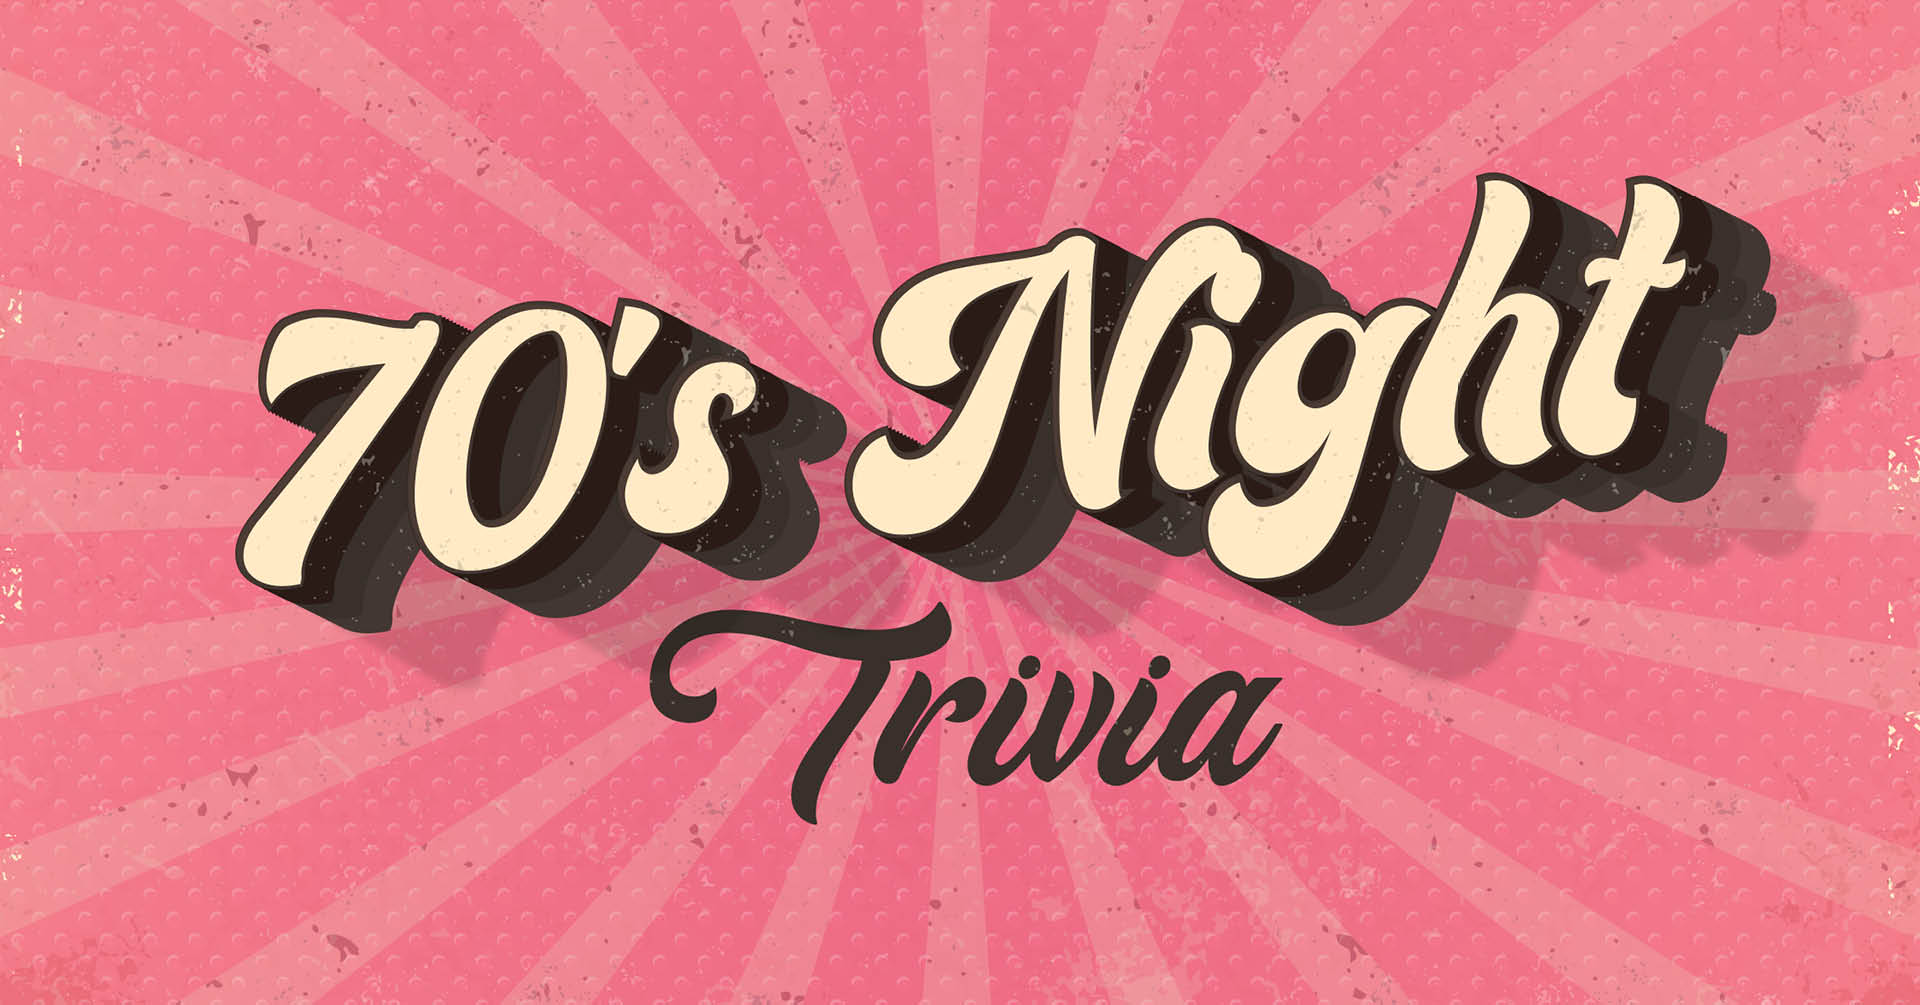 70s night trivia graphic